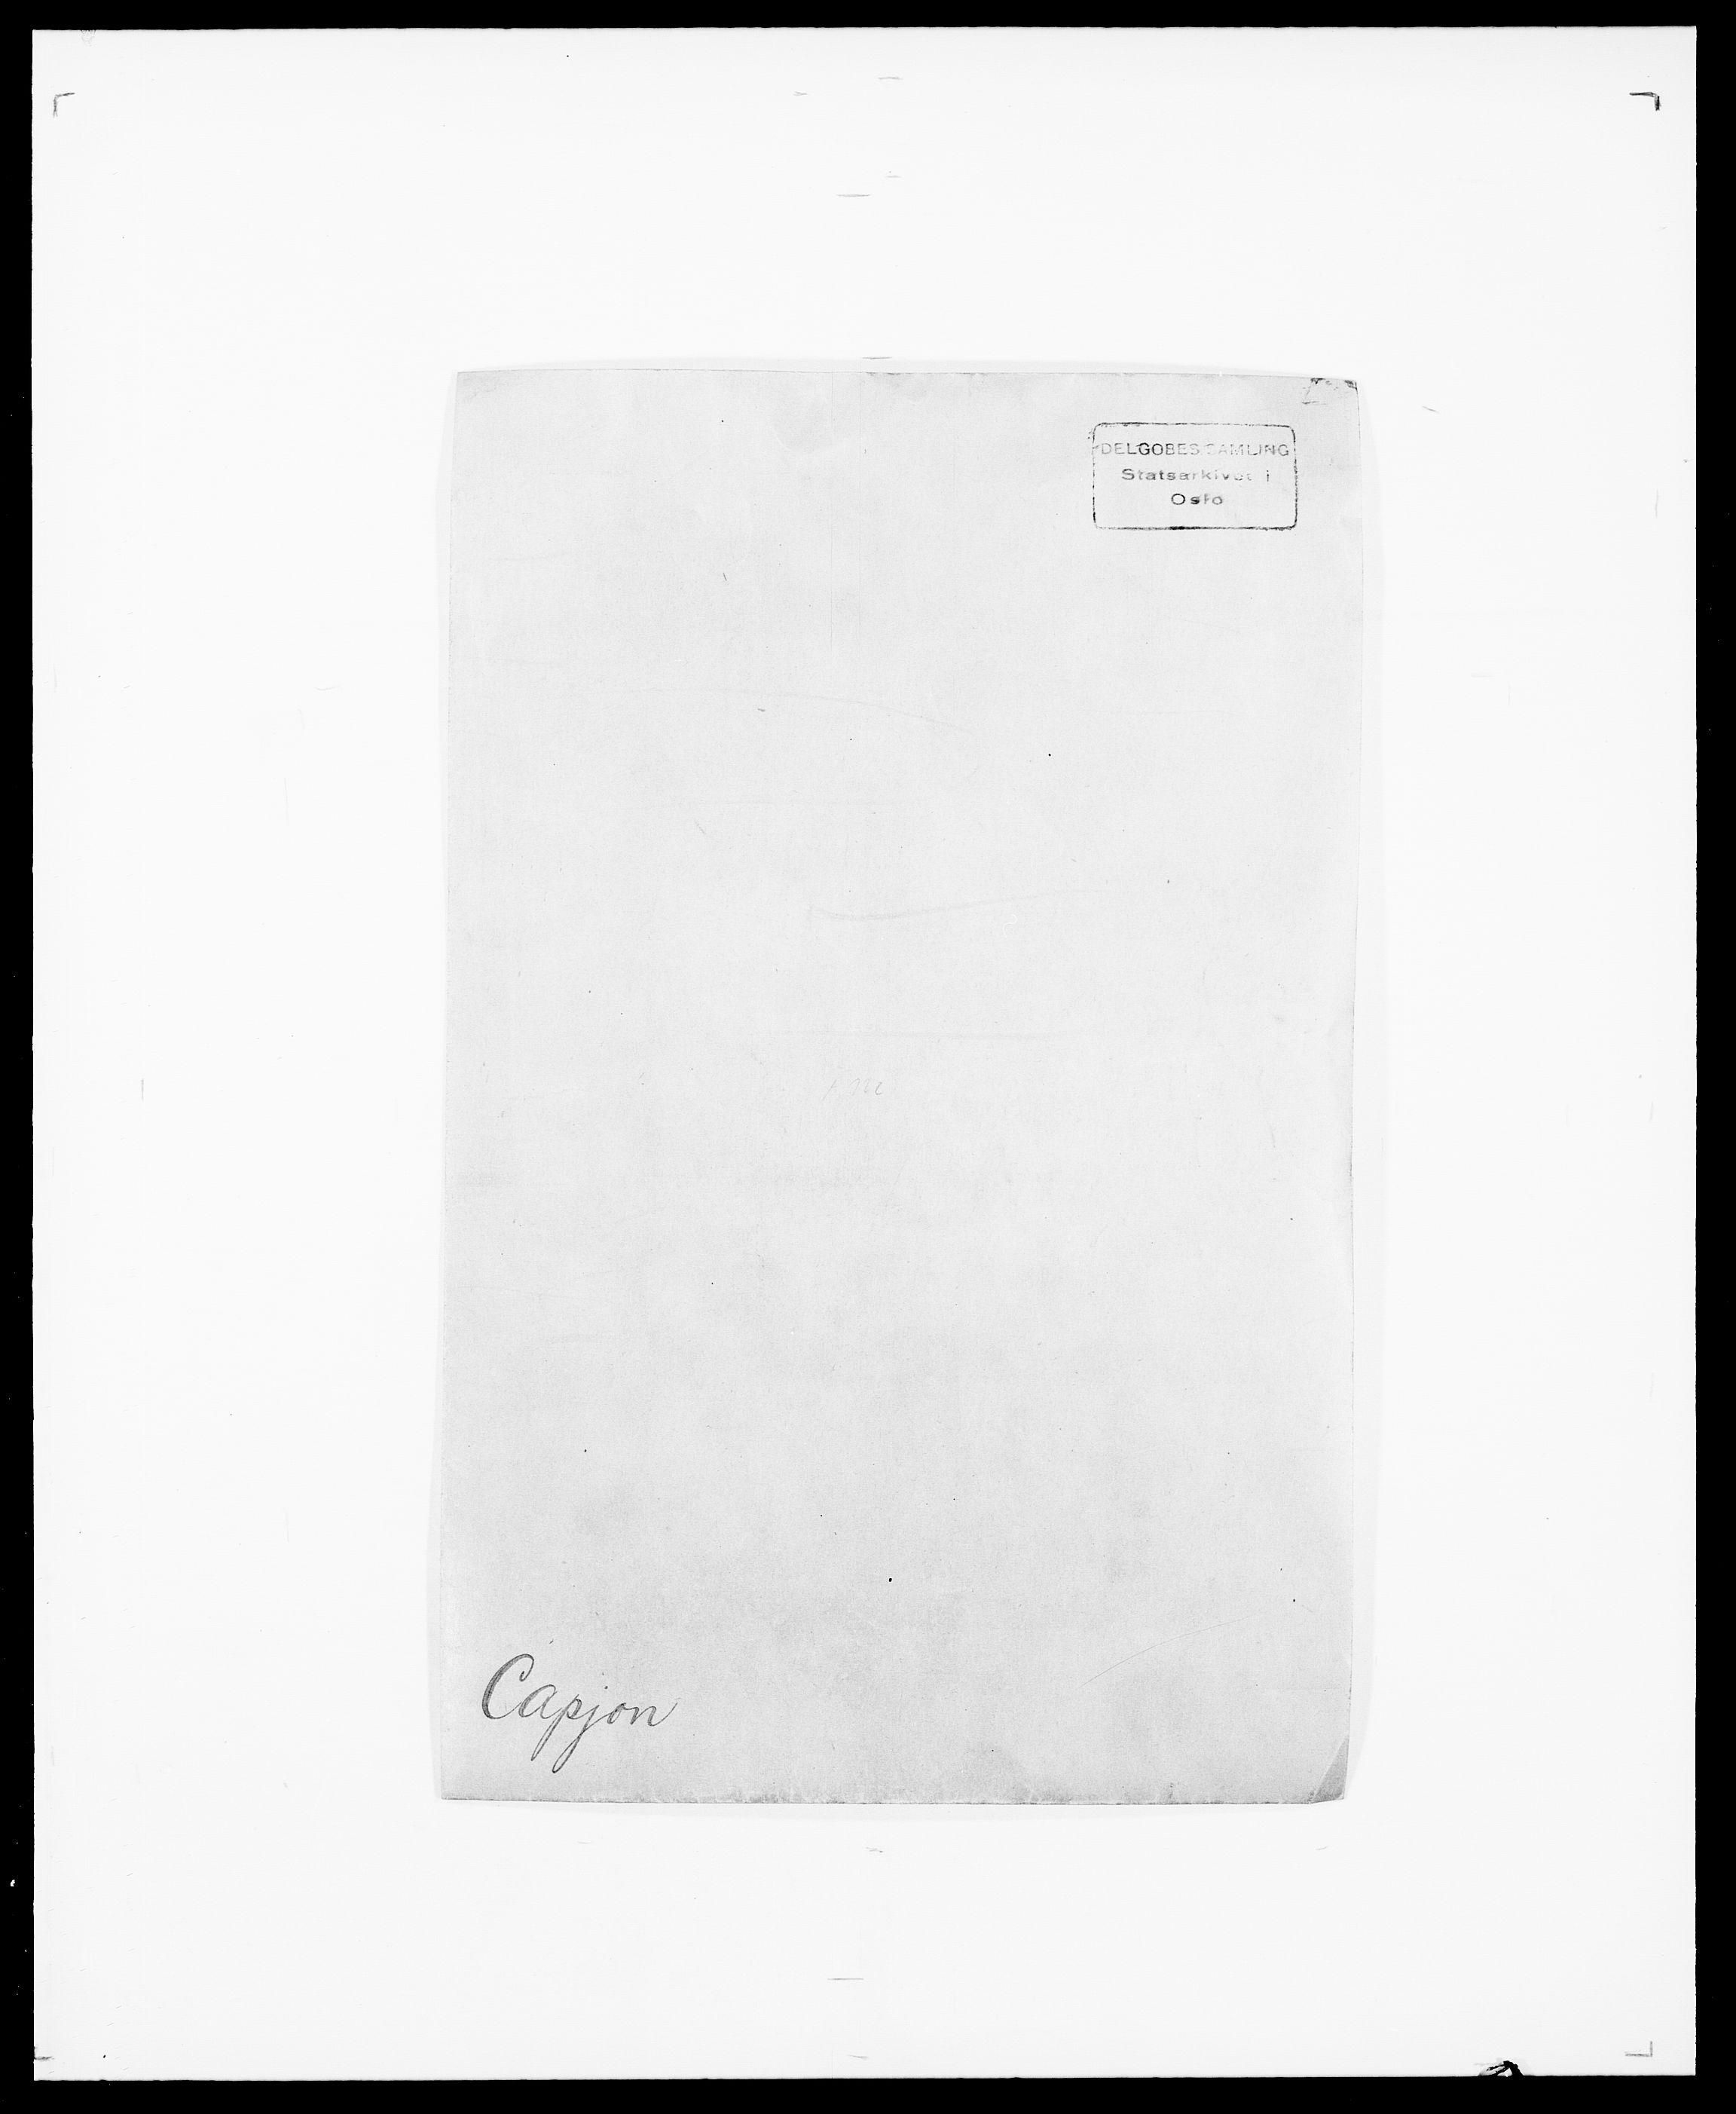 SAO, Delgobe, Charles Antoine - samling, D/Da/L0008: Capjon - Dagenbolt, s. 1